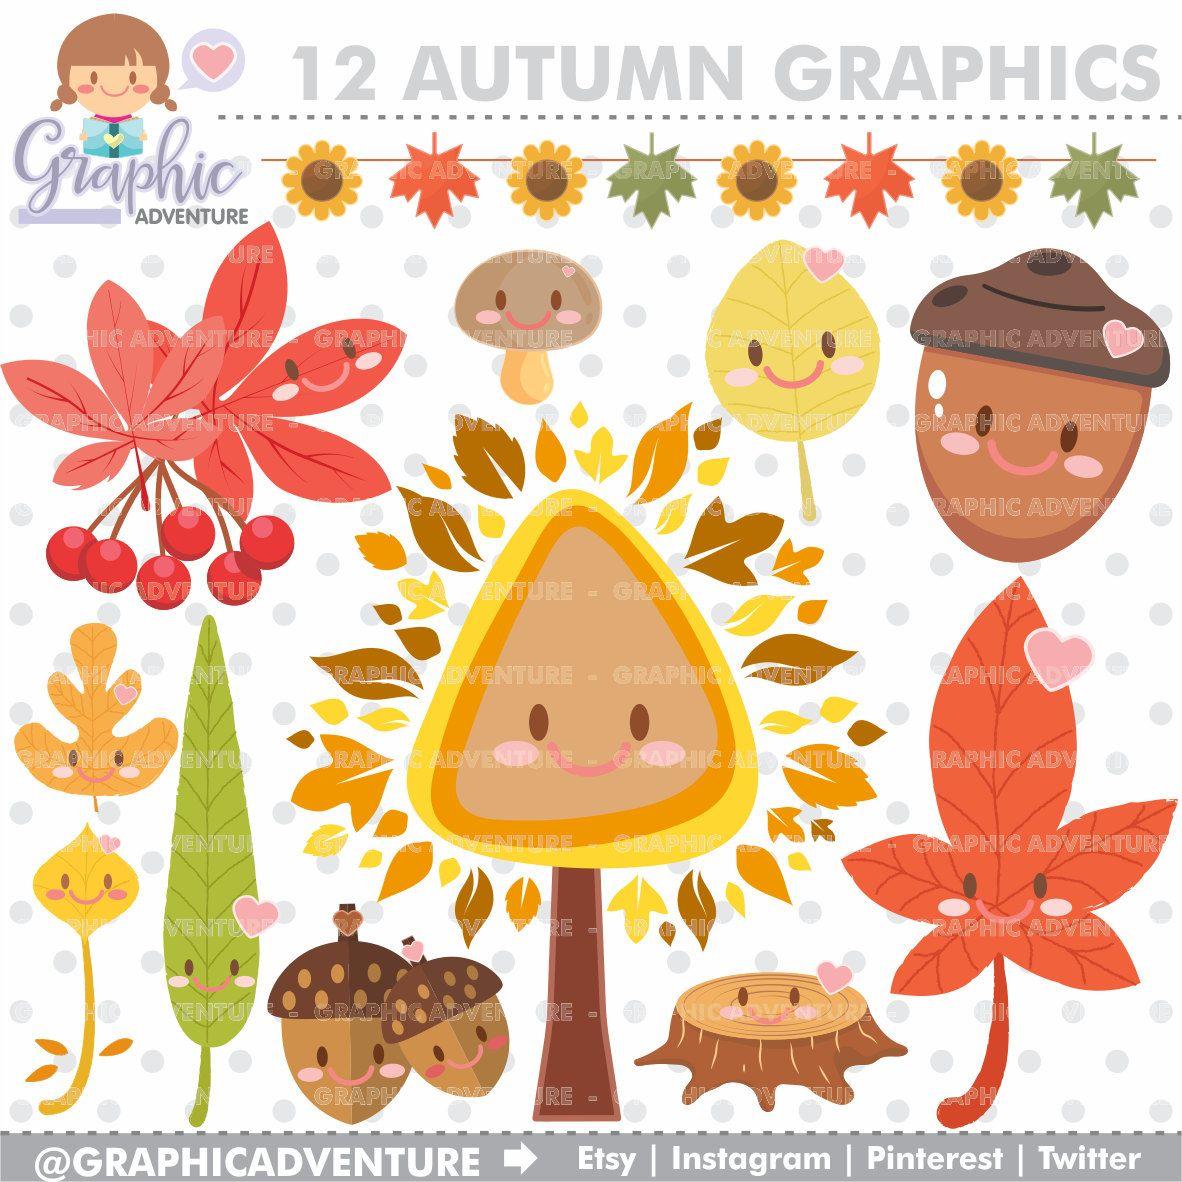 Autumn clipart cartoon. Graphics commercial use kawaii